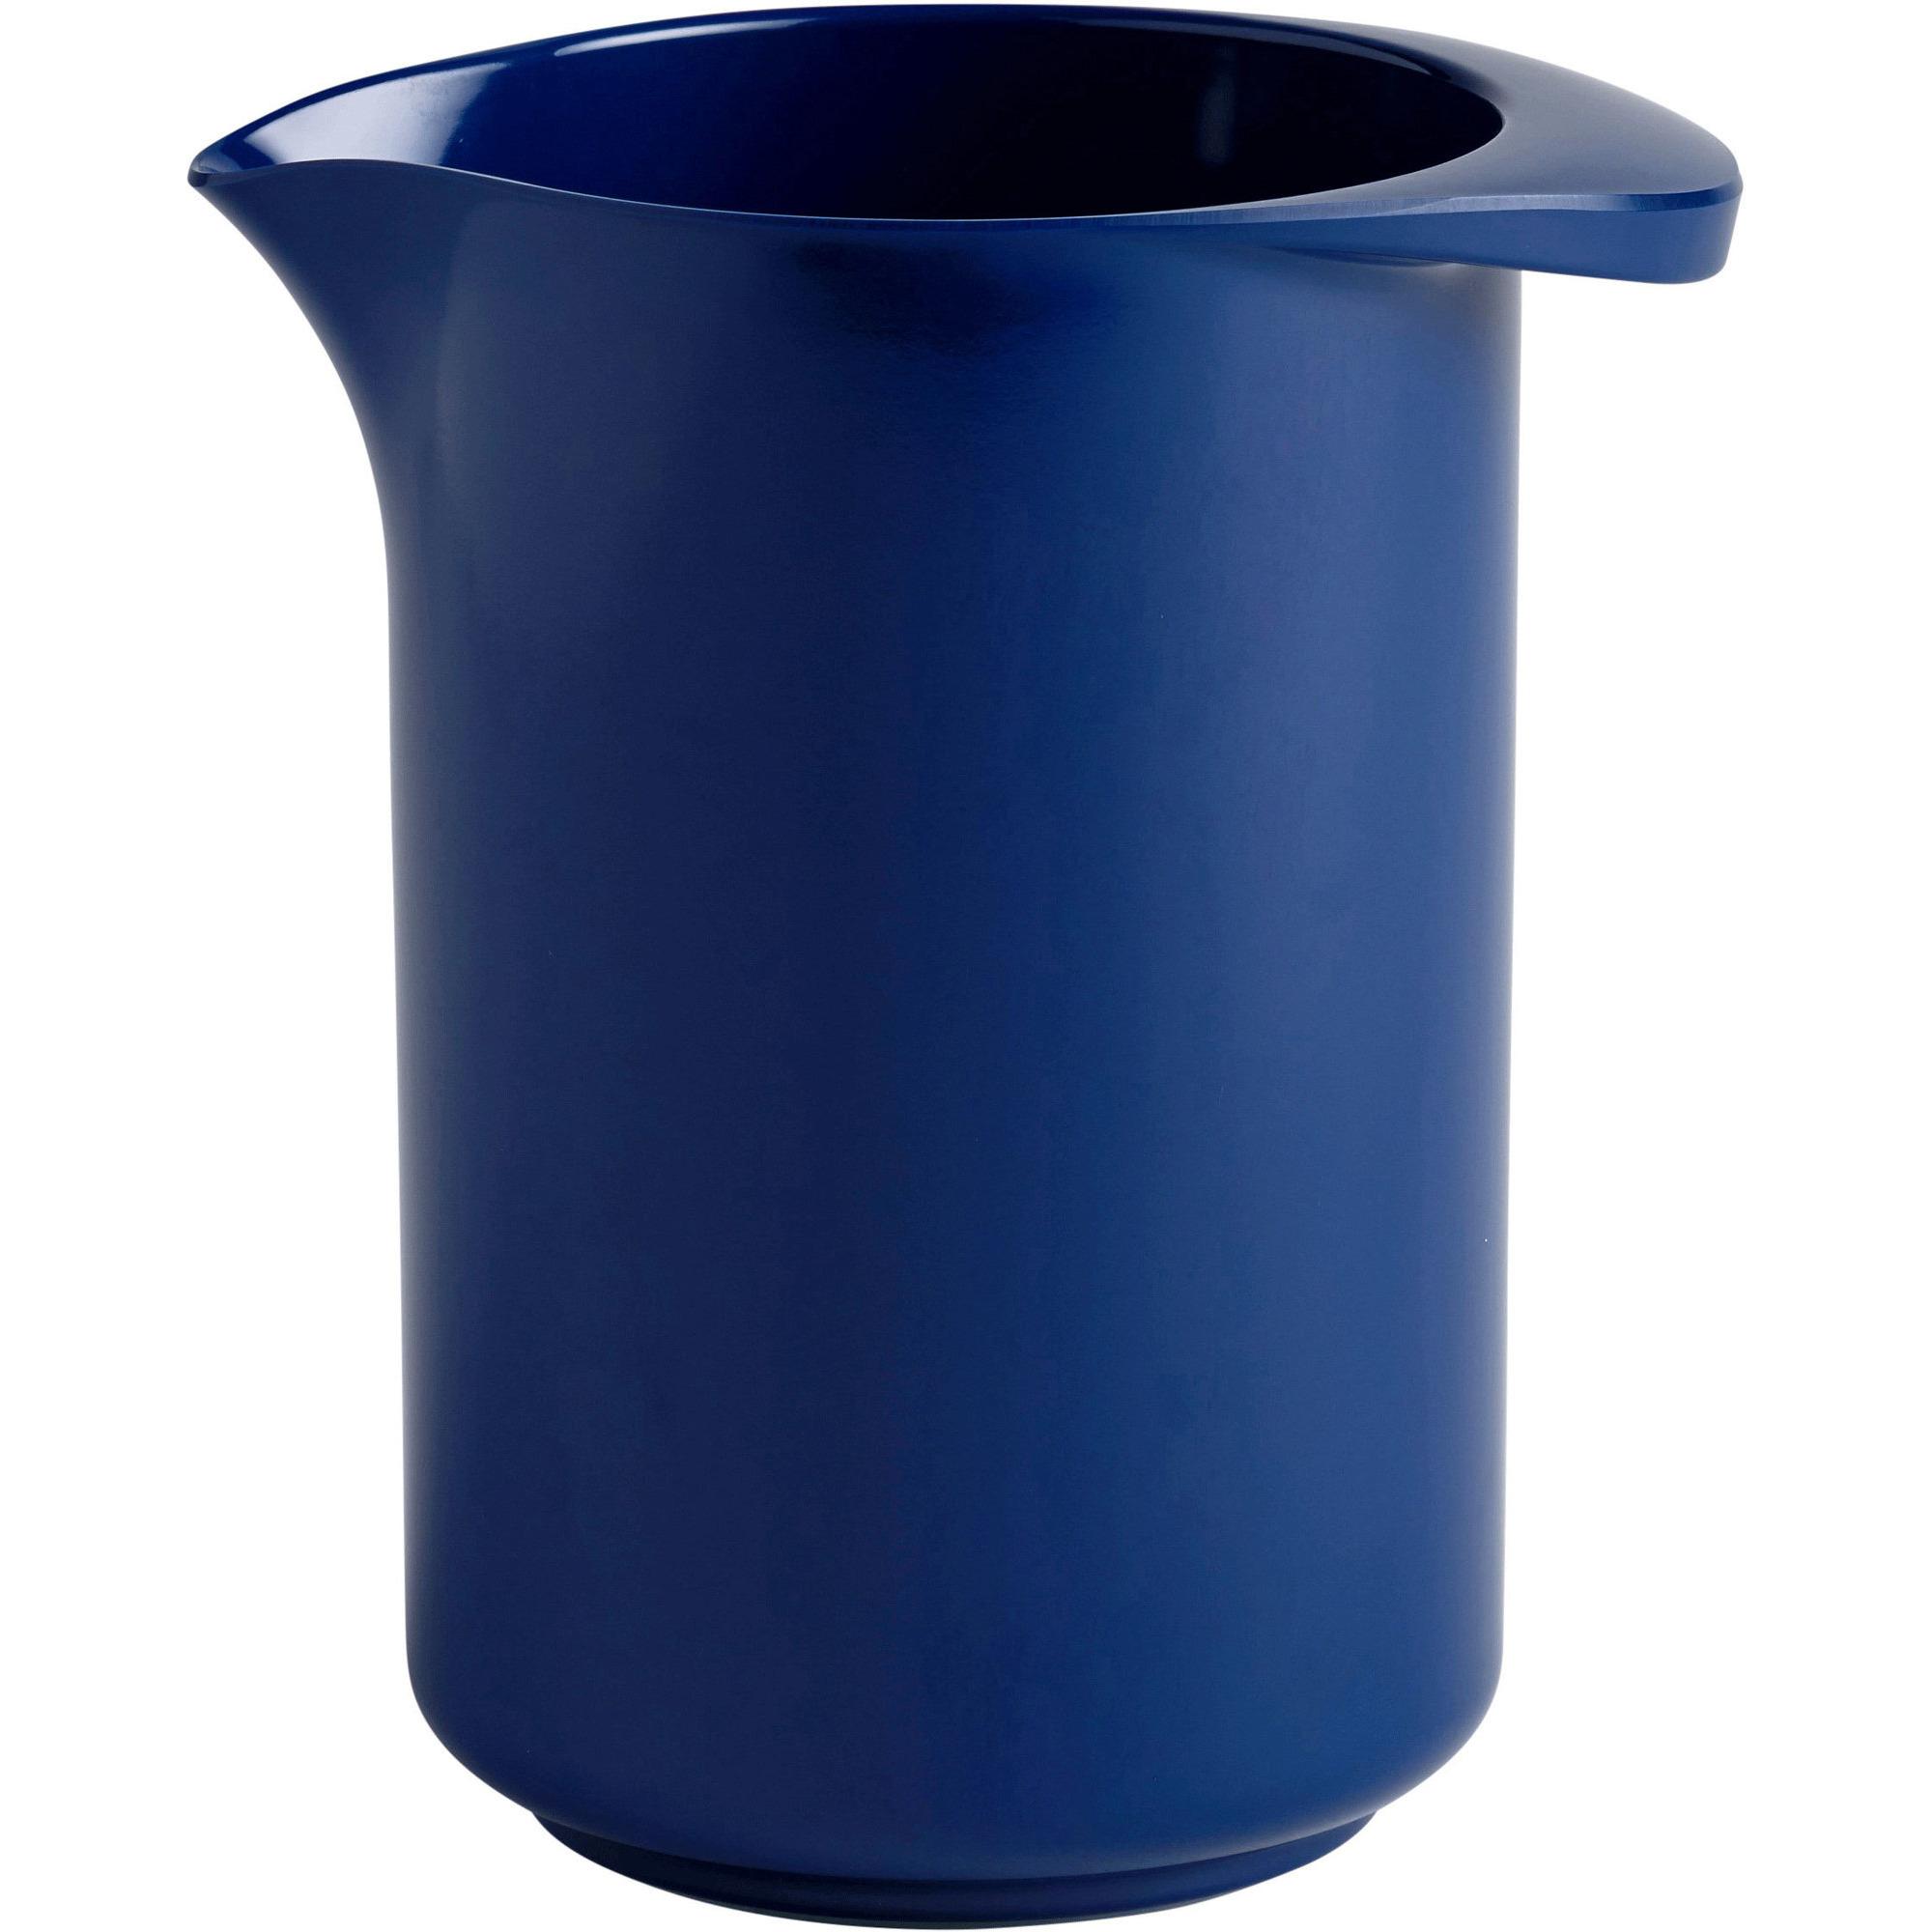 Rosti Mepal mixkanna 05 L (Indigo blue)